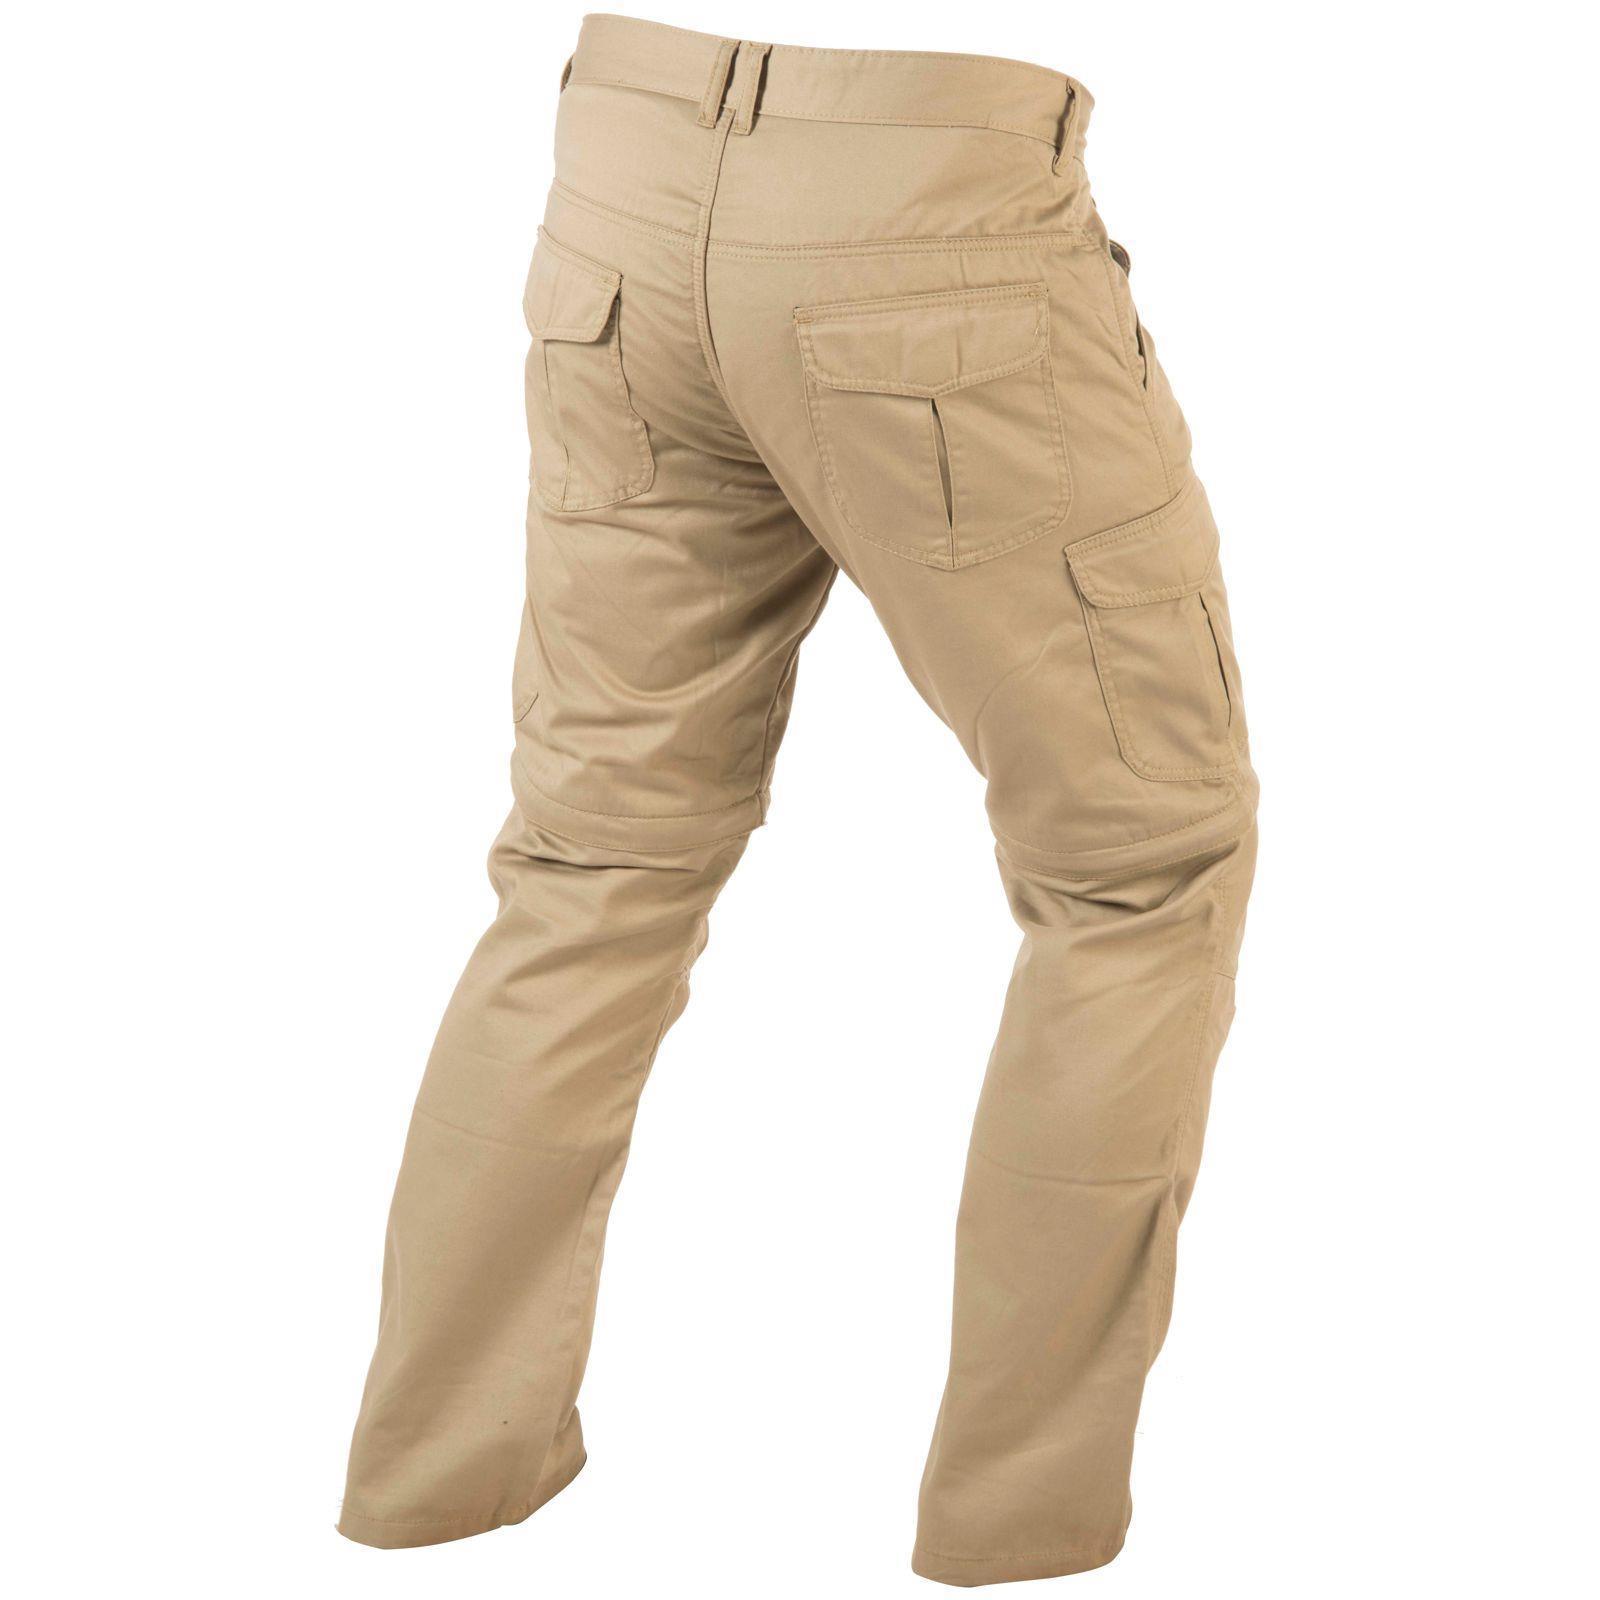 Trilobite-Pantaloni-Moto-Jeans-Abbigliamento-Parado-MICAS-URBAN-DUAL-PANTS-ACID miniatura 63